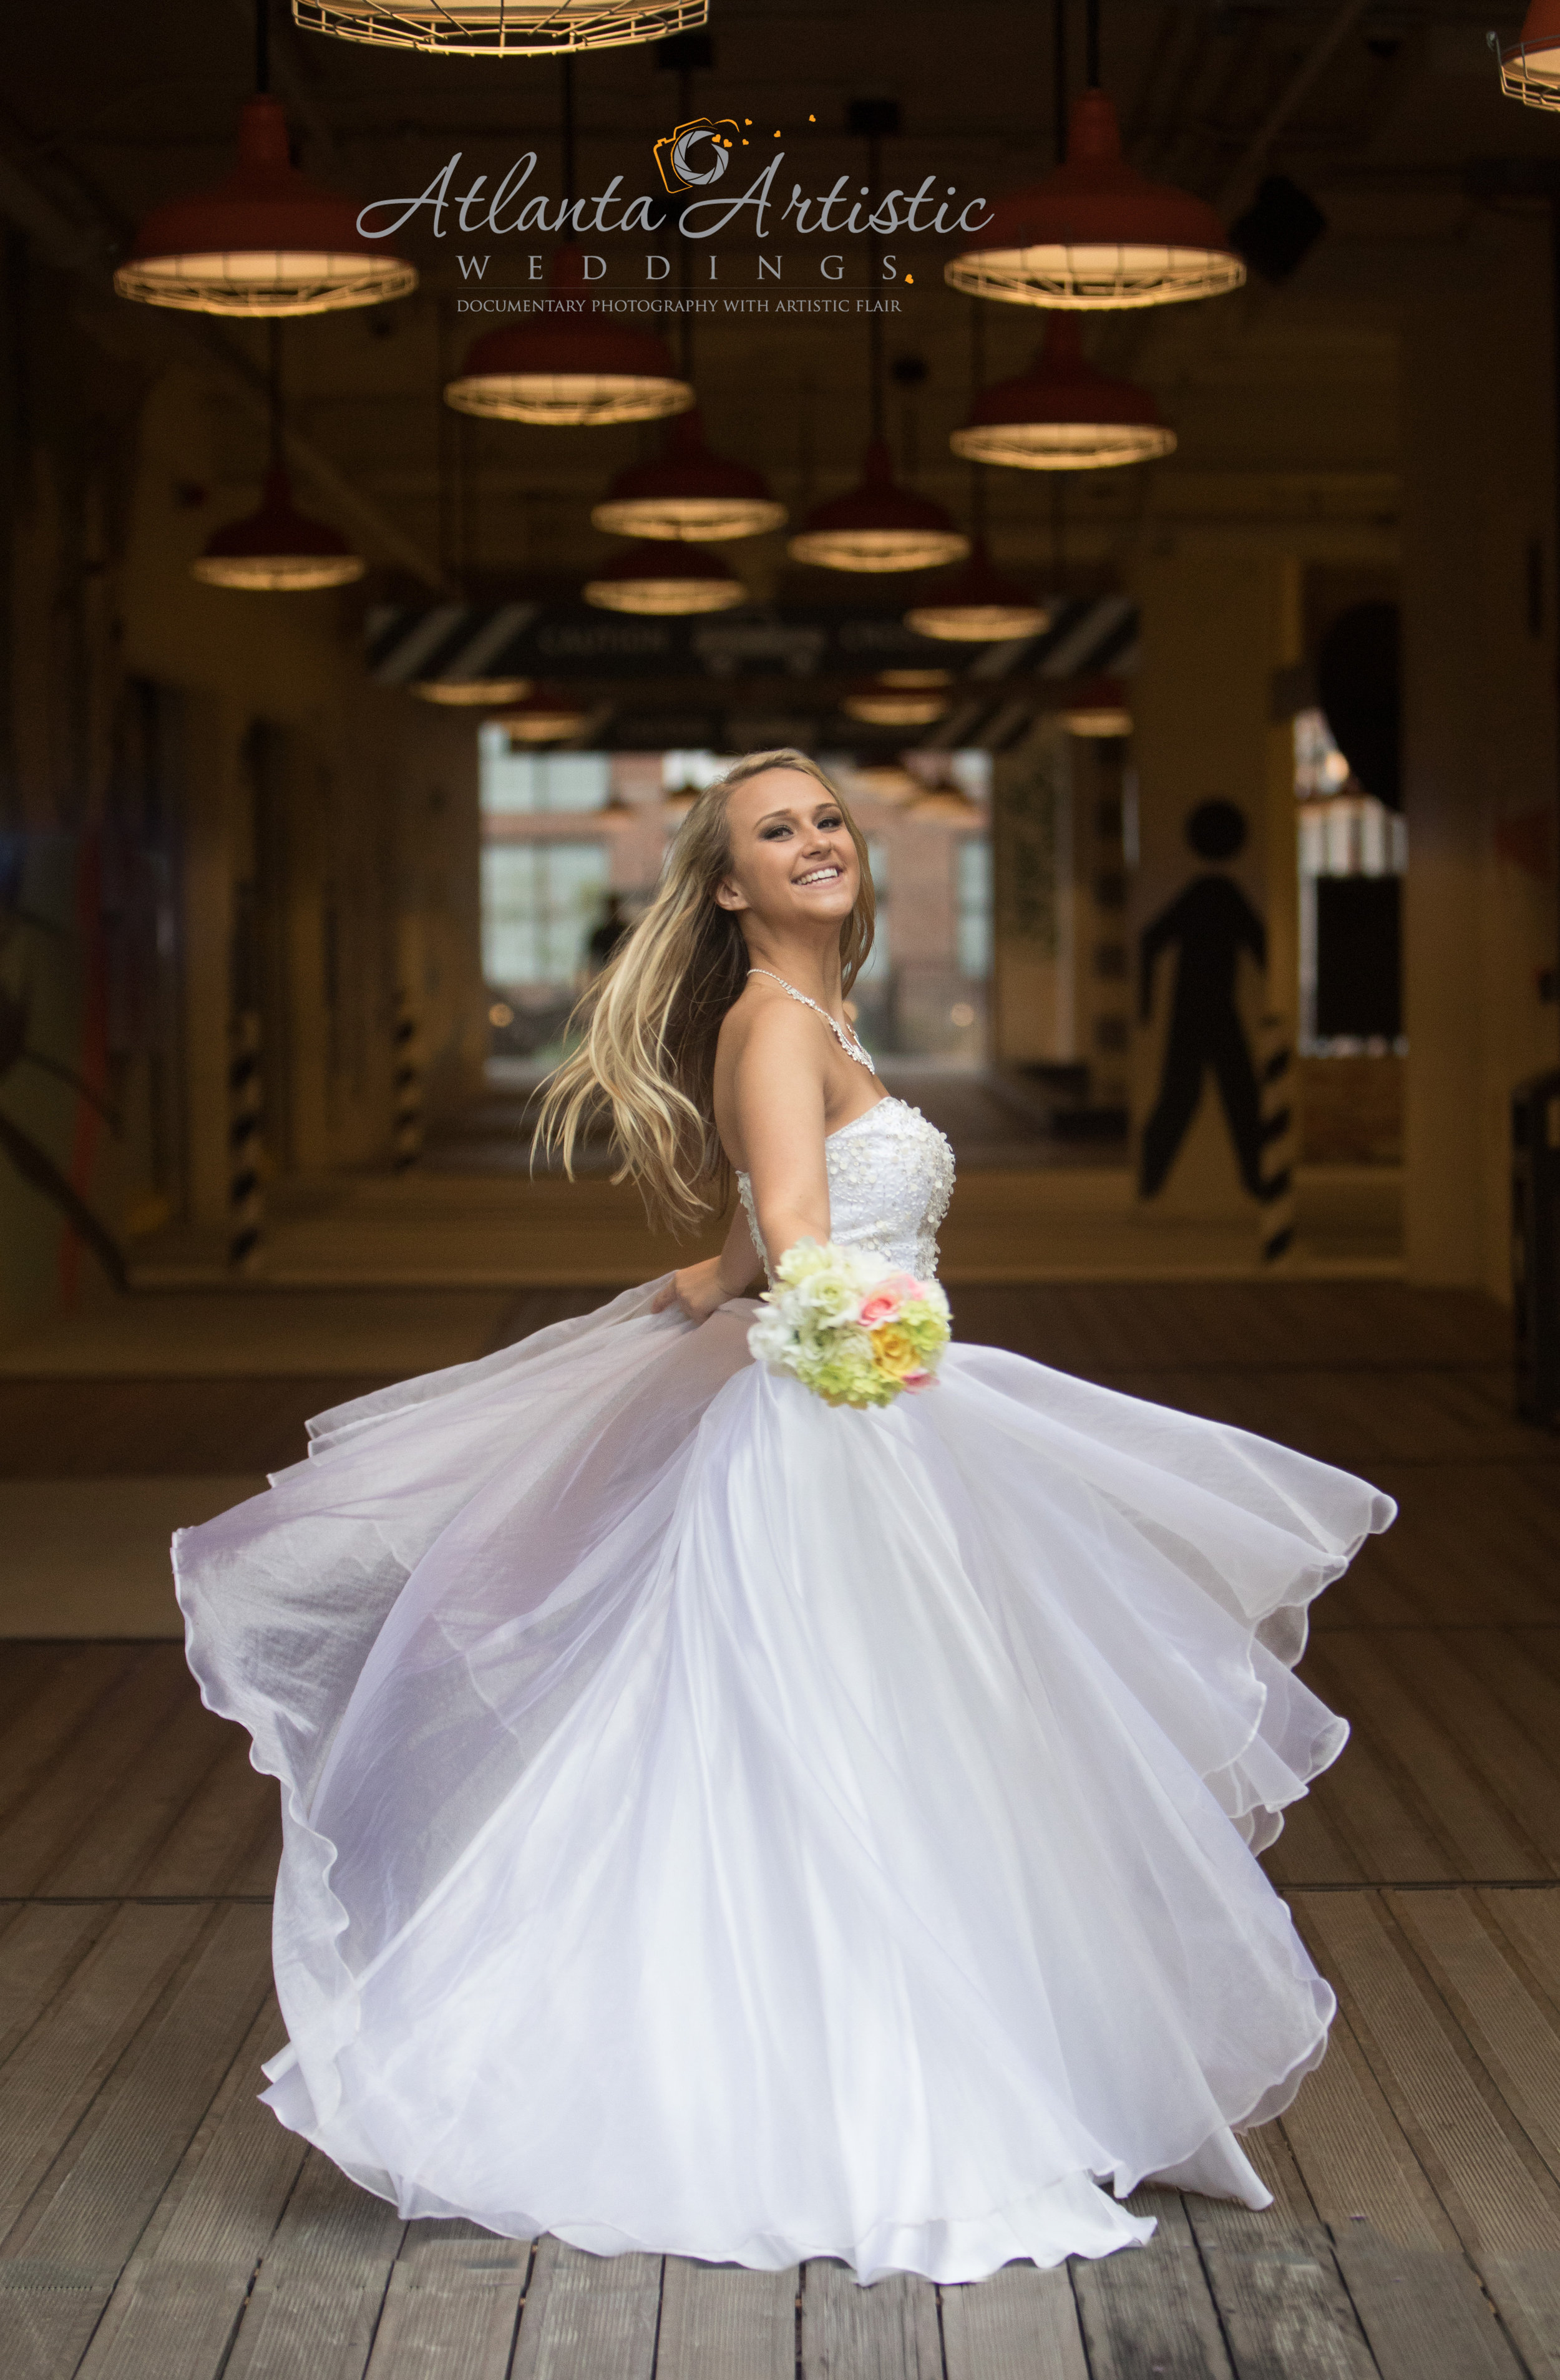 Atlanta Wedding Photography: Atlanta Artistic Wedding PhotographerAtlanta Wedding